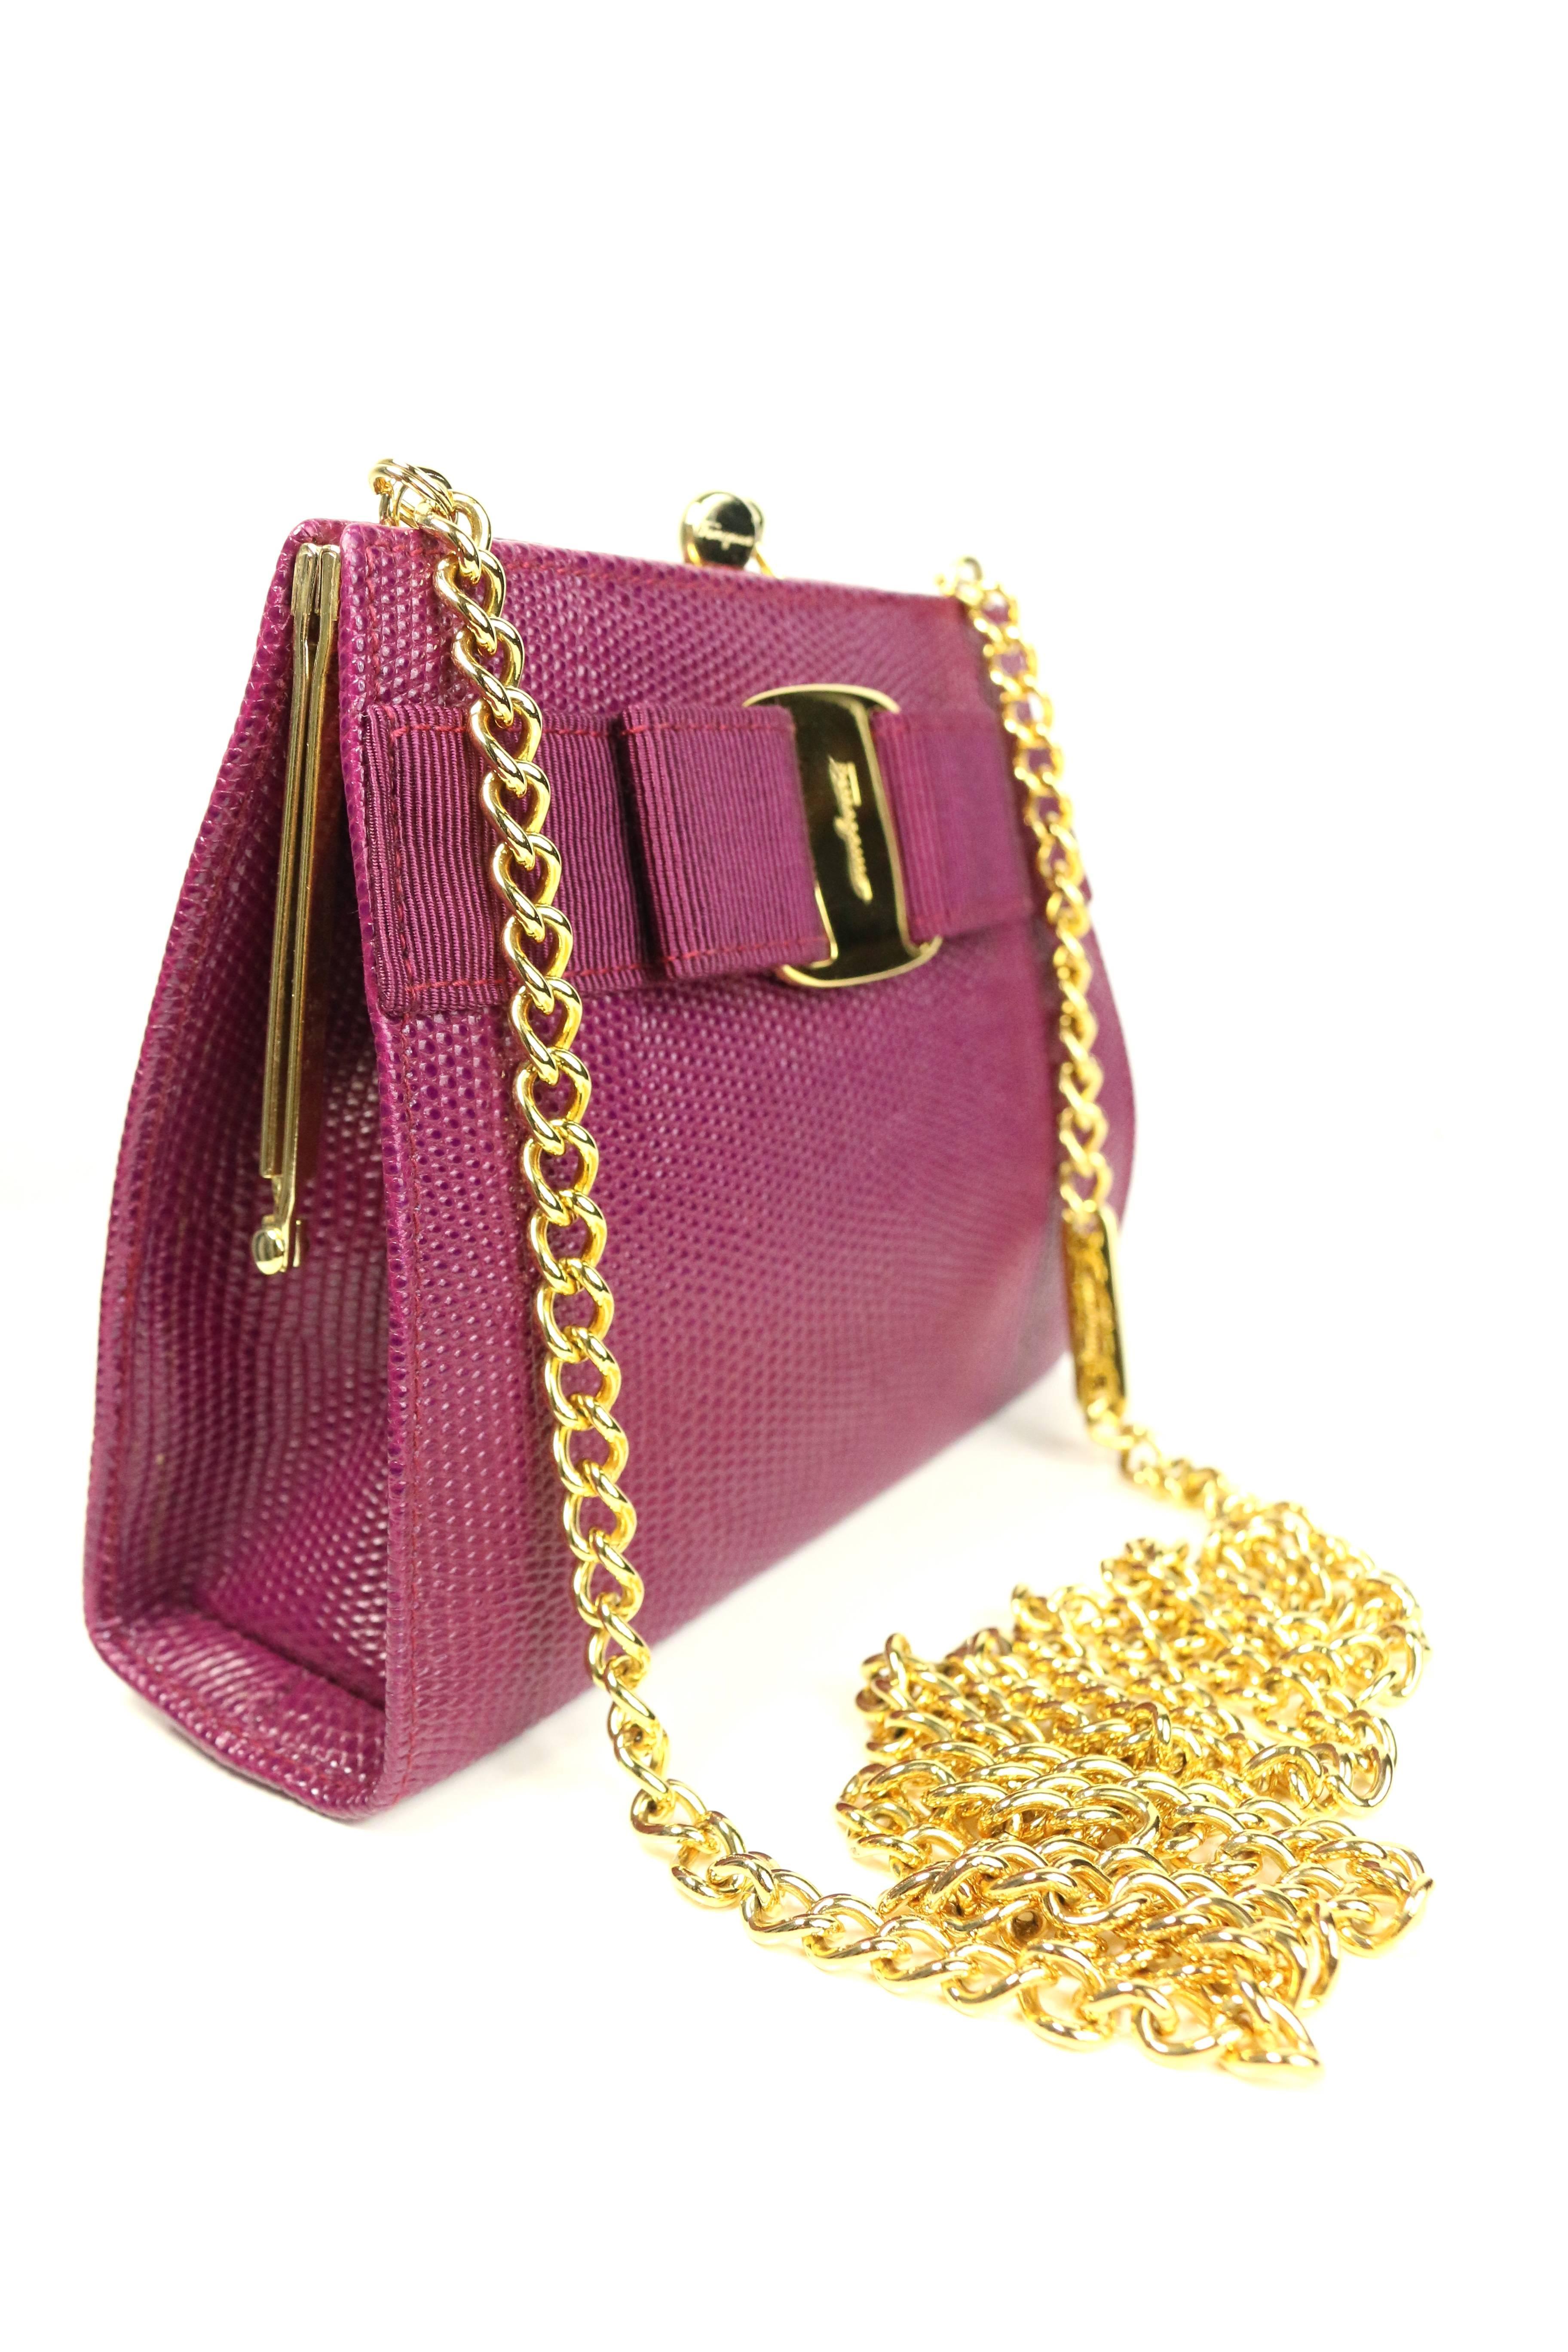 884e8ea41873 Salvatore Ferragamo Purple Lizard Skin Gold Chain Shoulder Bag at 1stdibs